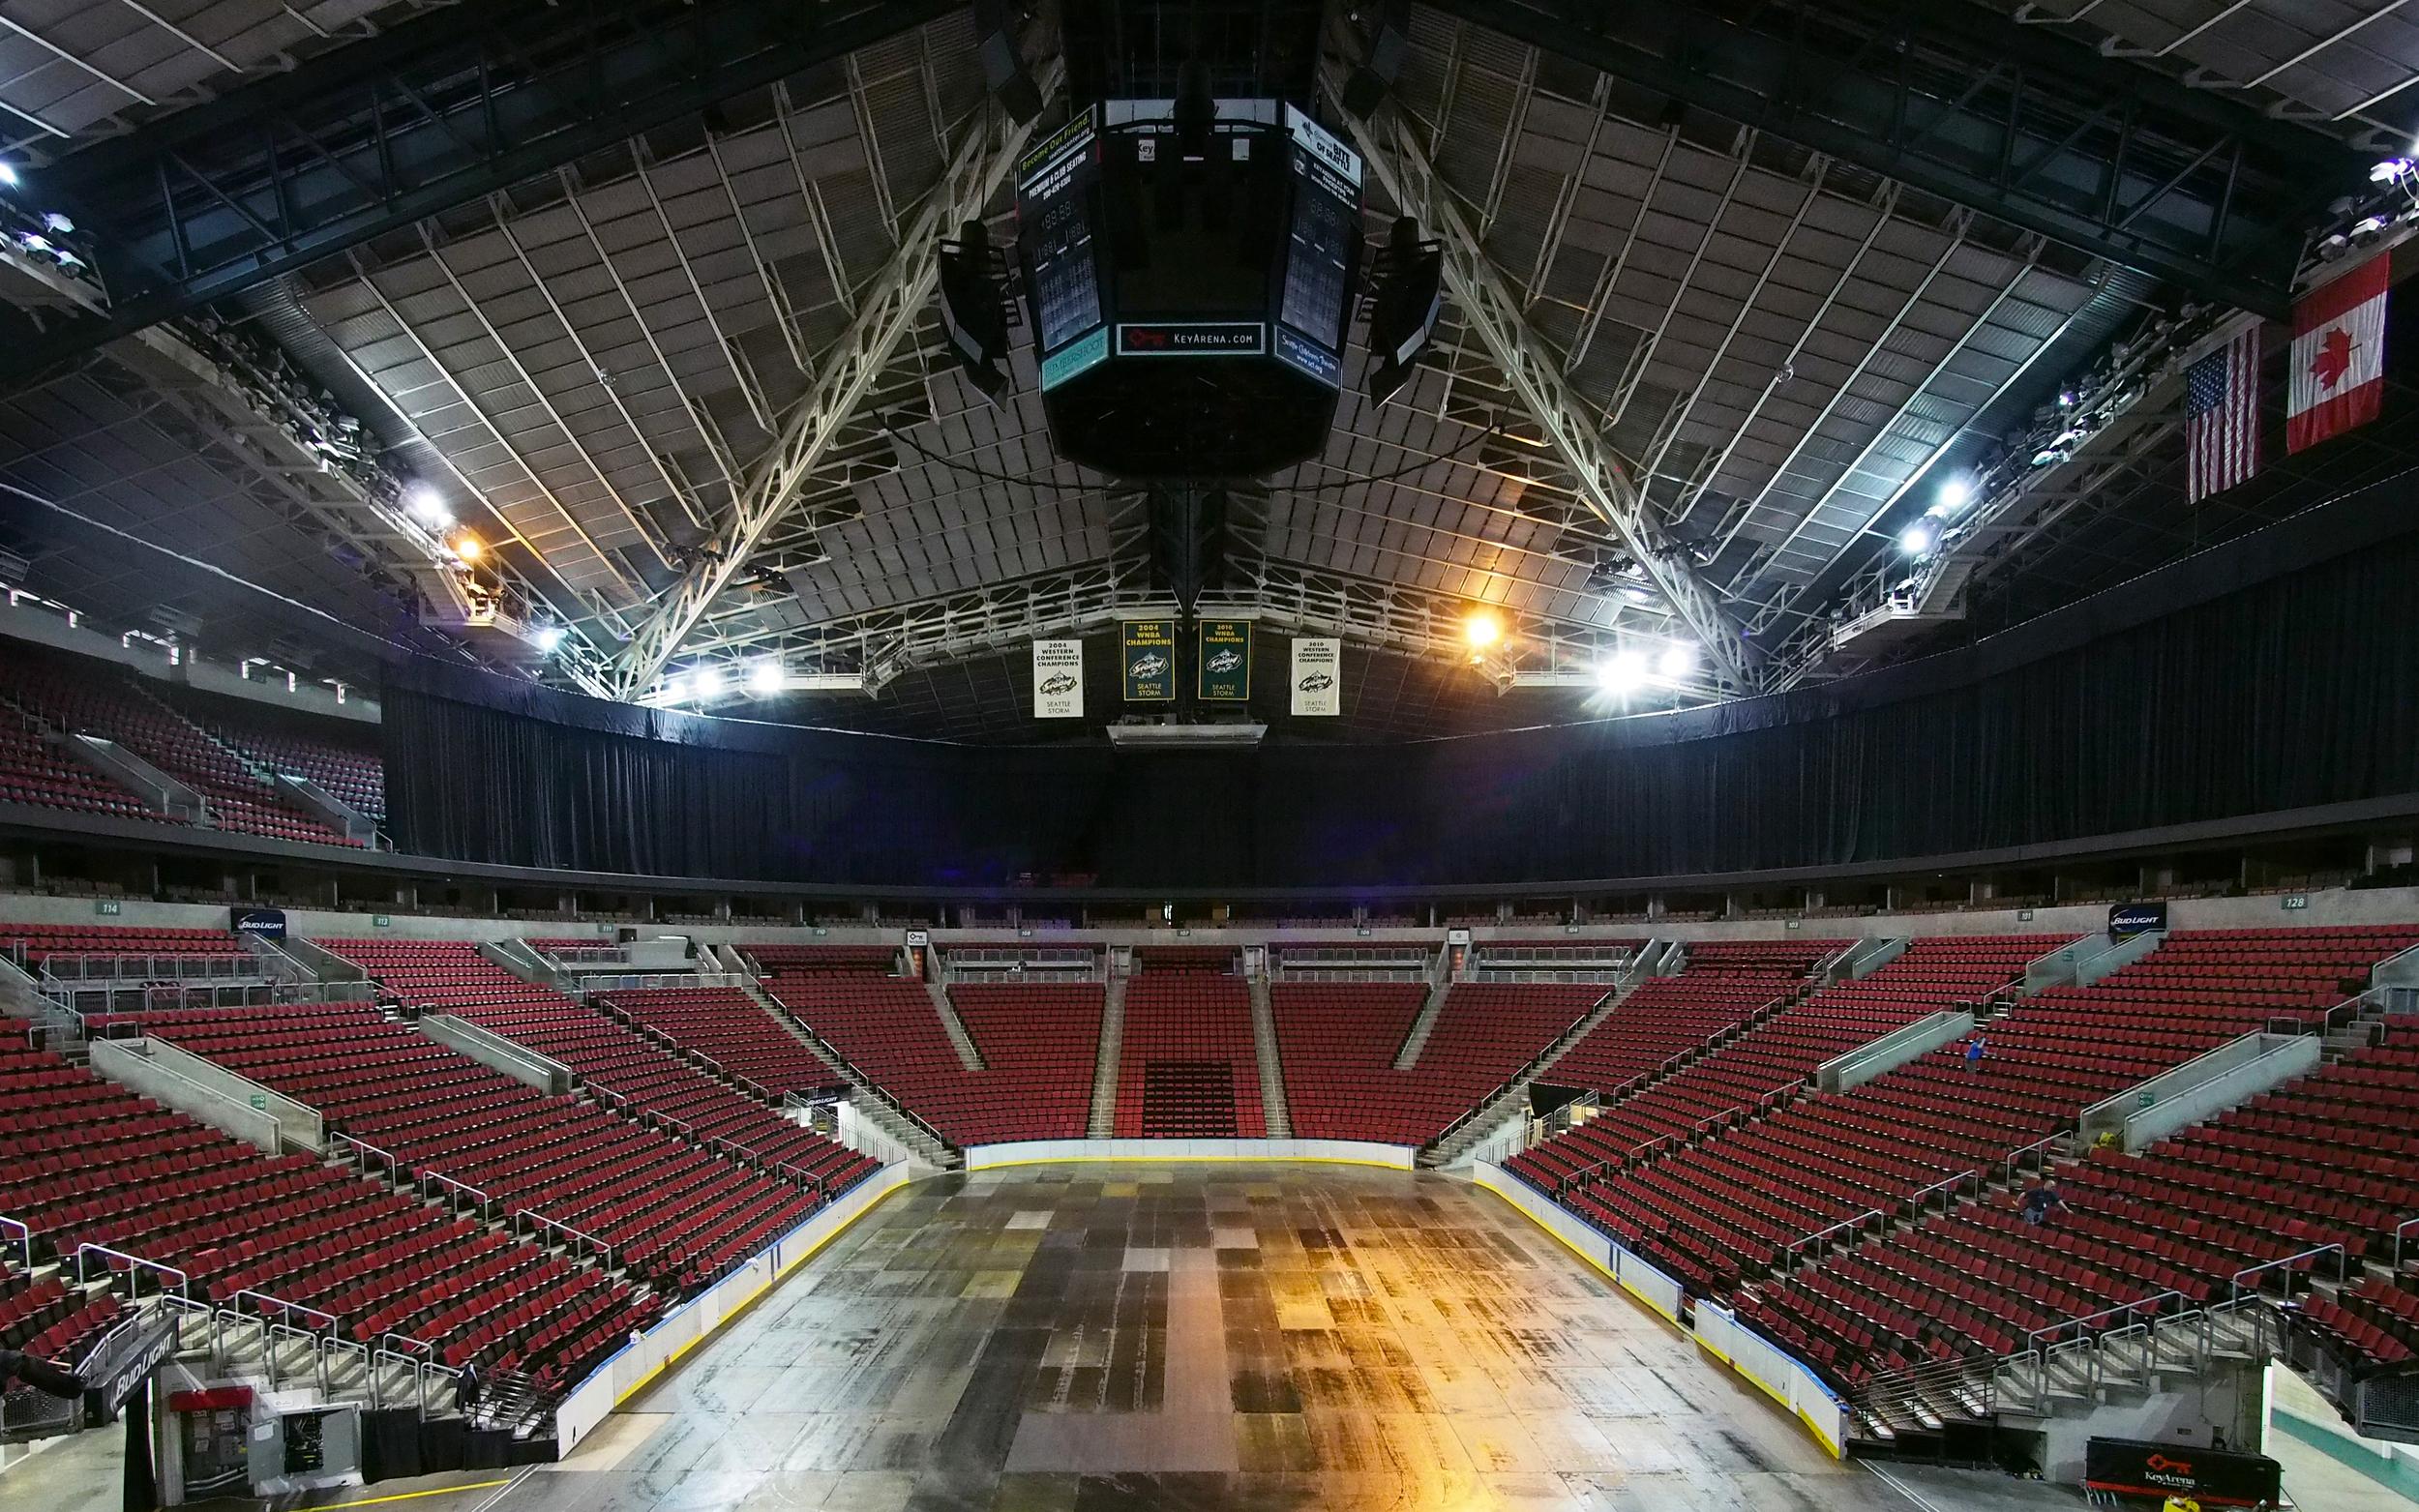 14_0522 Key Arena Interior 1.jpg